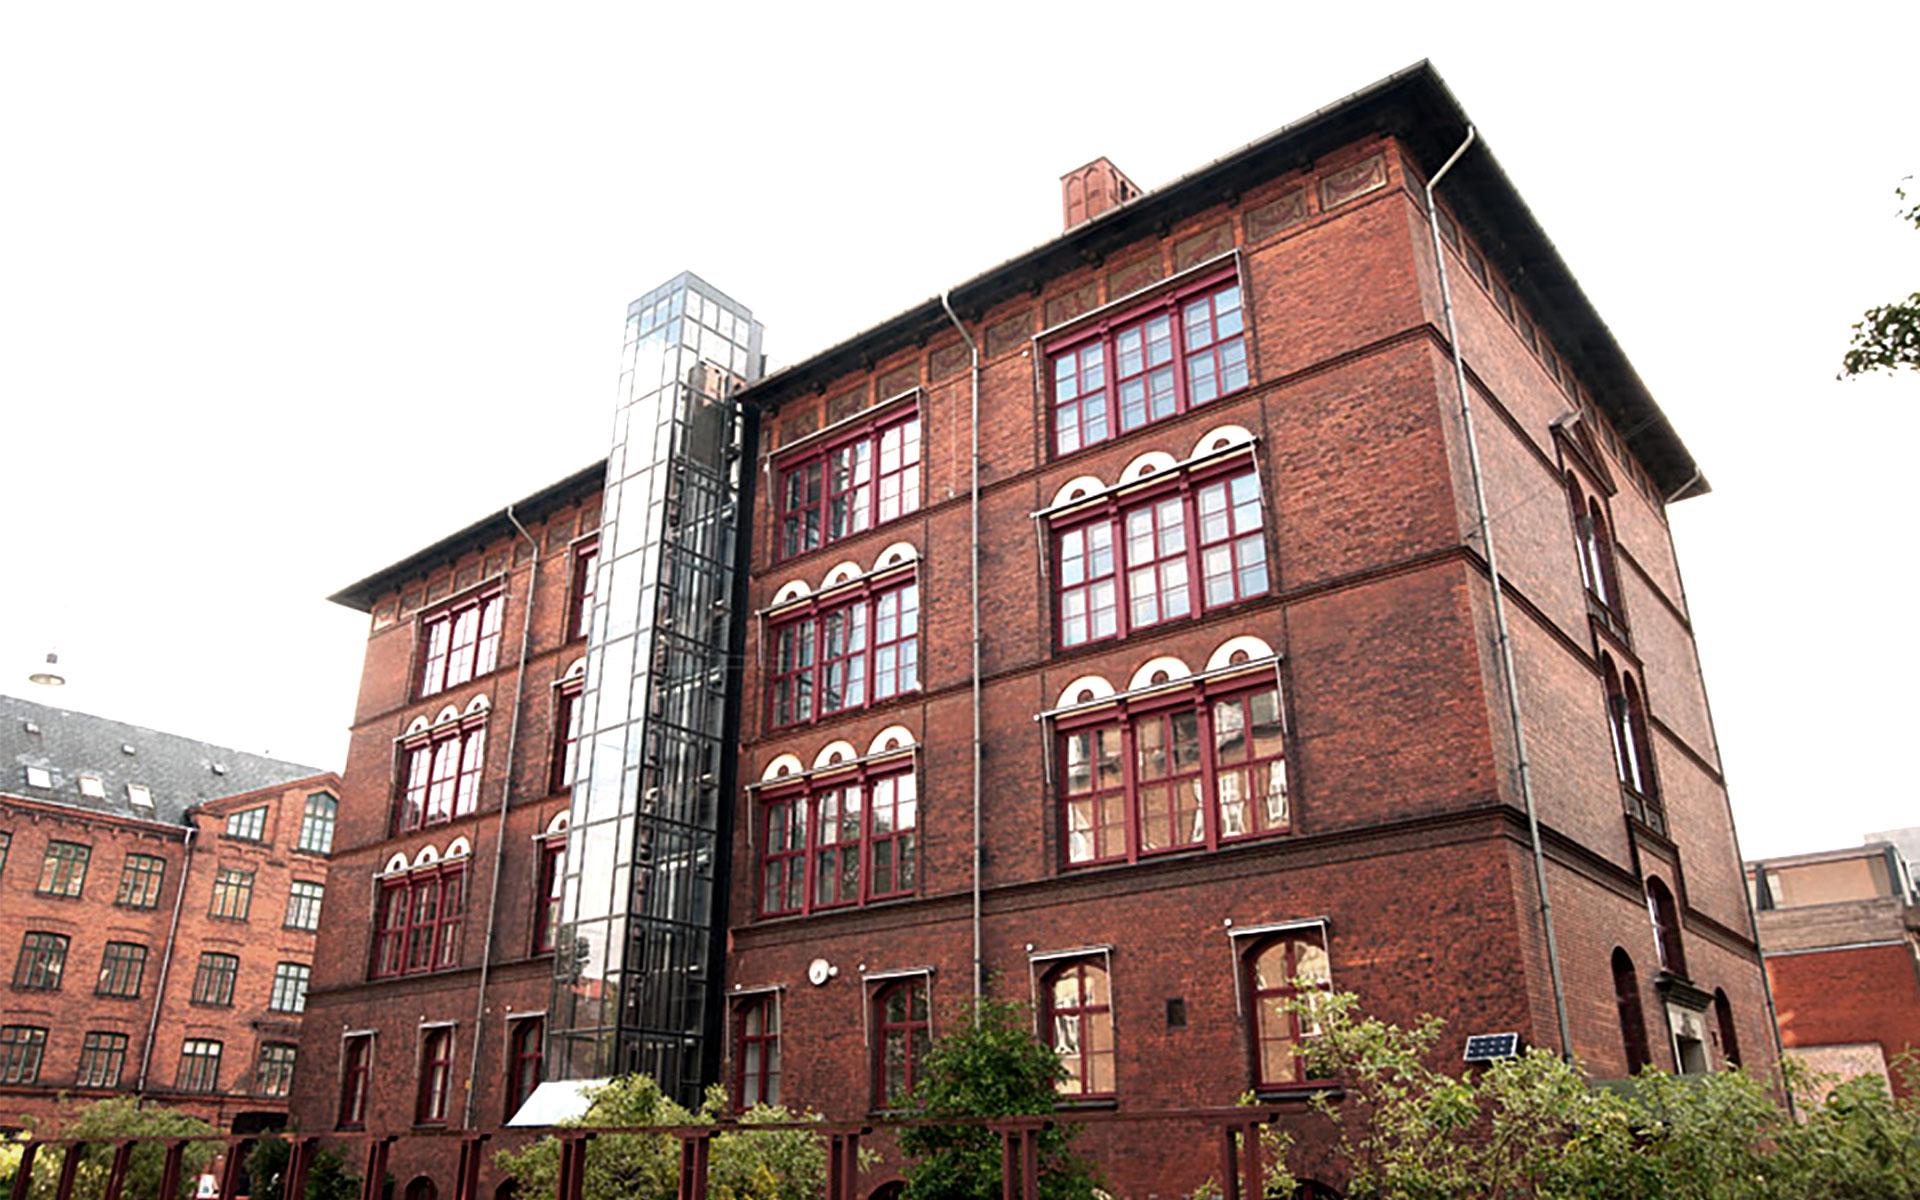 Blågård-skole-01-08062012-_DSC9681-2-1920x1200